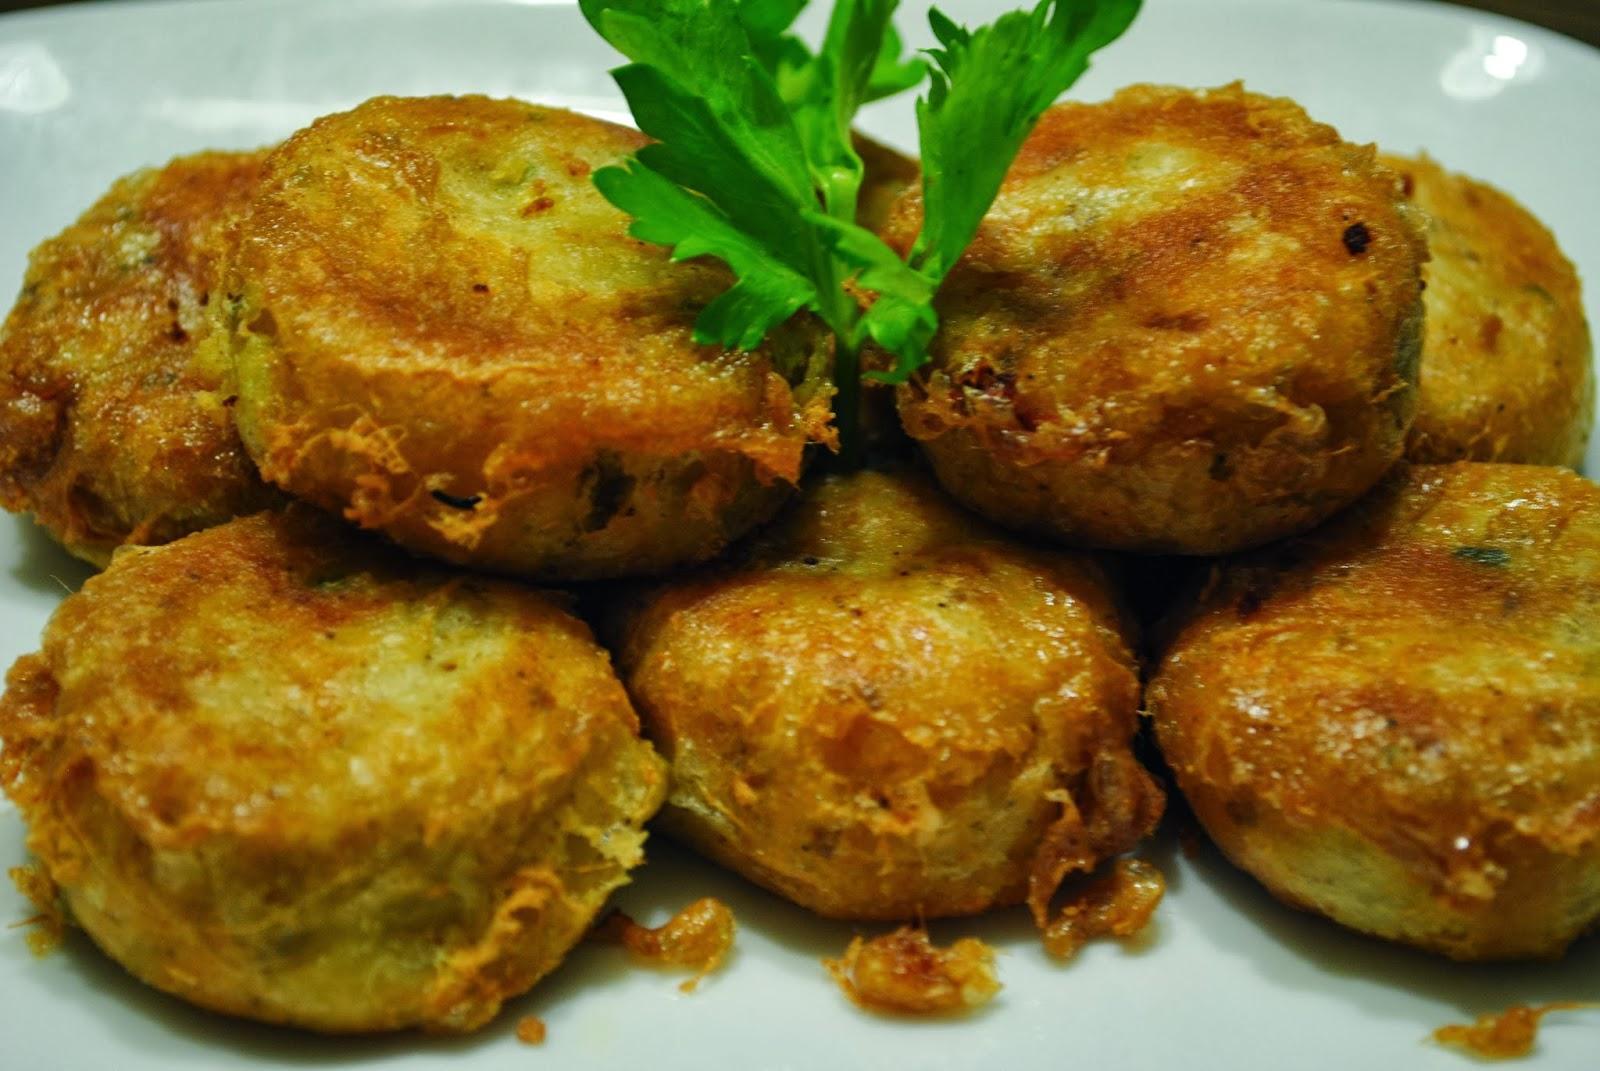 Resep Masakan Perkedel Kentang kombinasi daging empuk enak ...